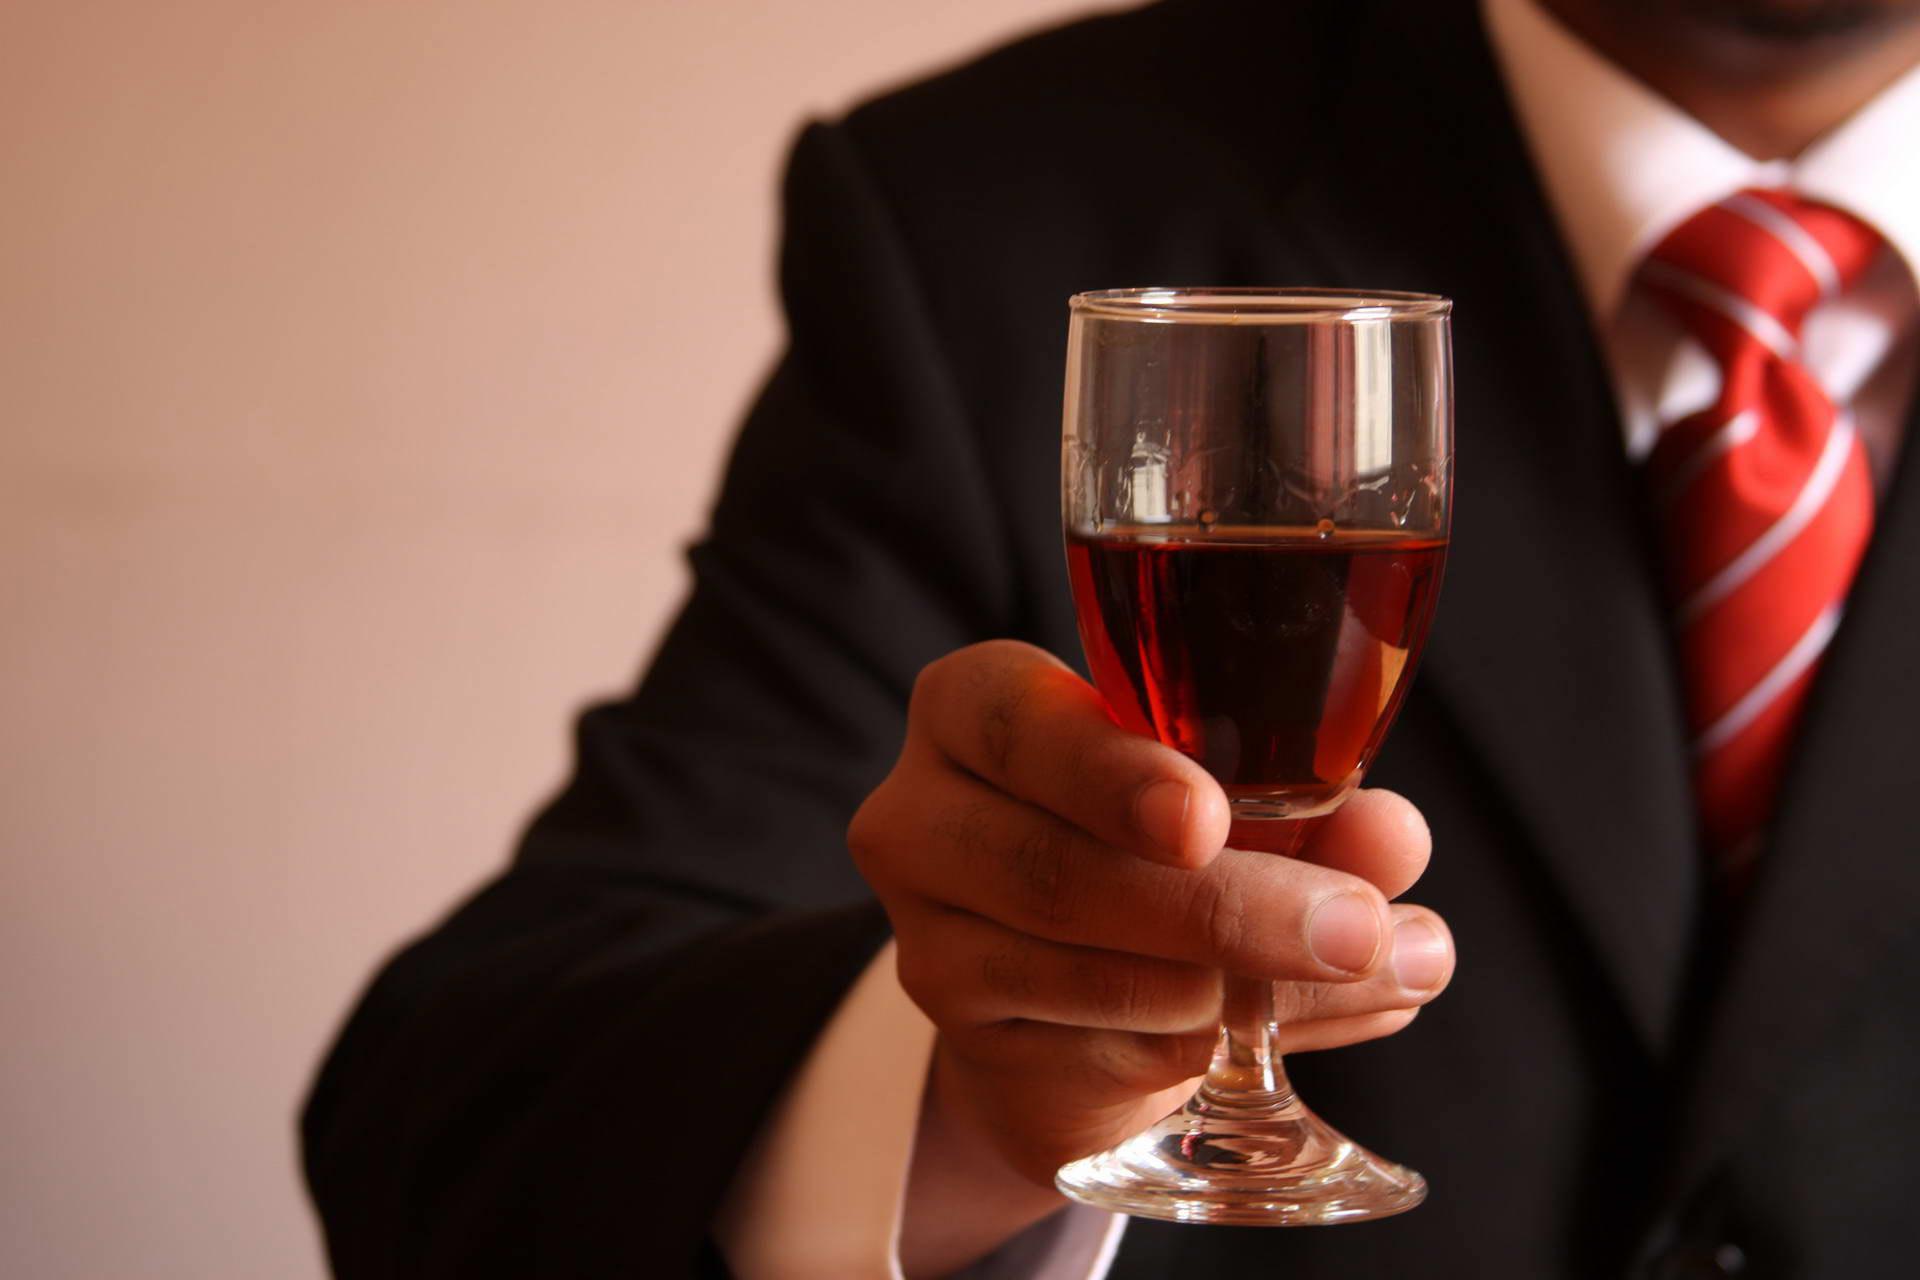 мужчина с бокалом вина